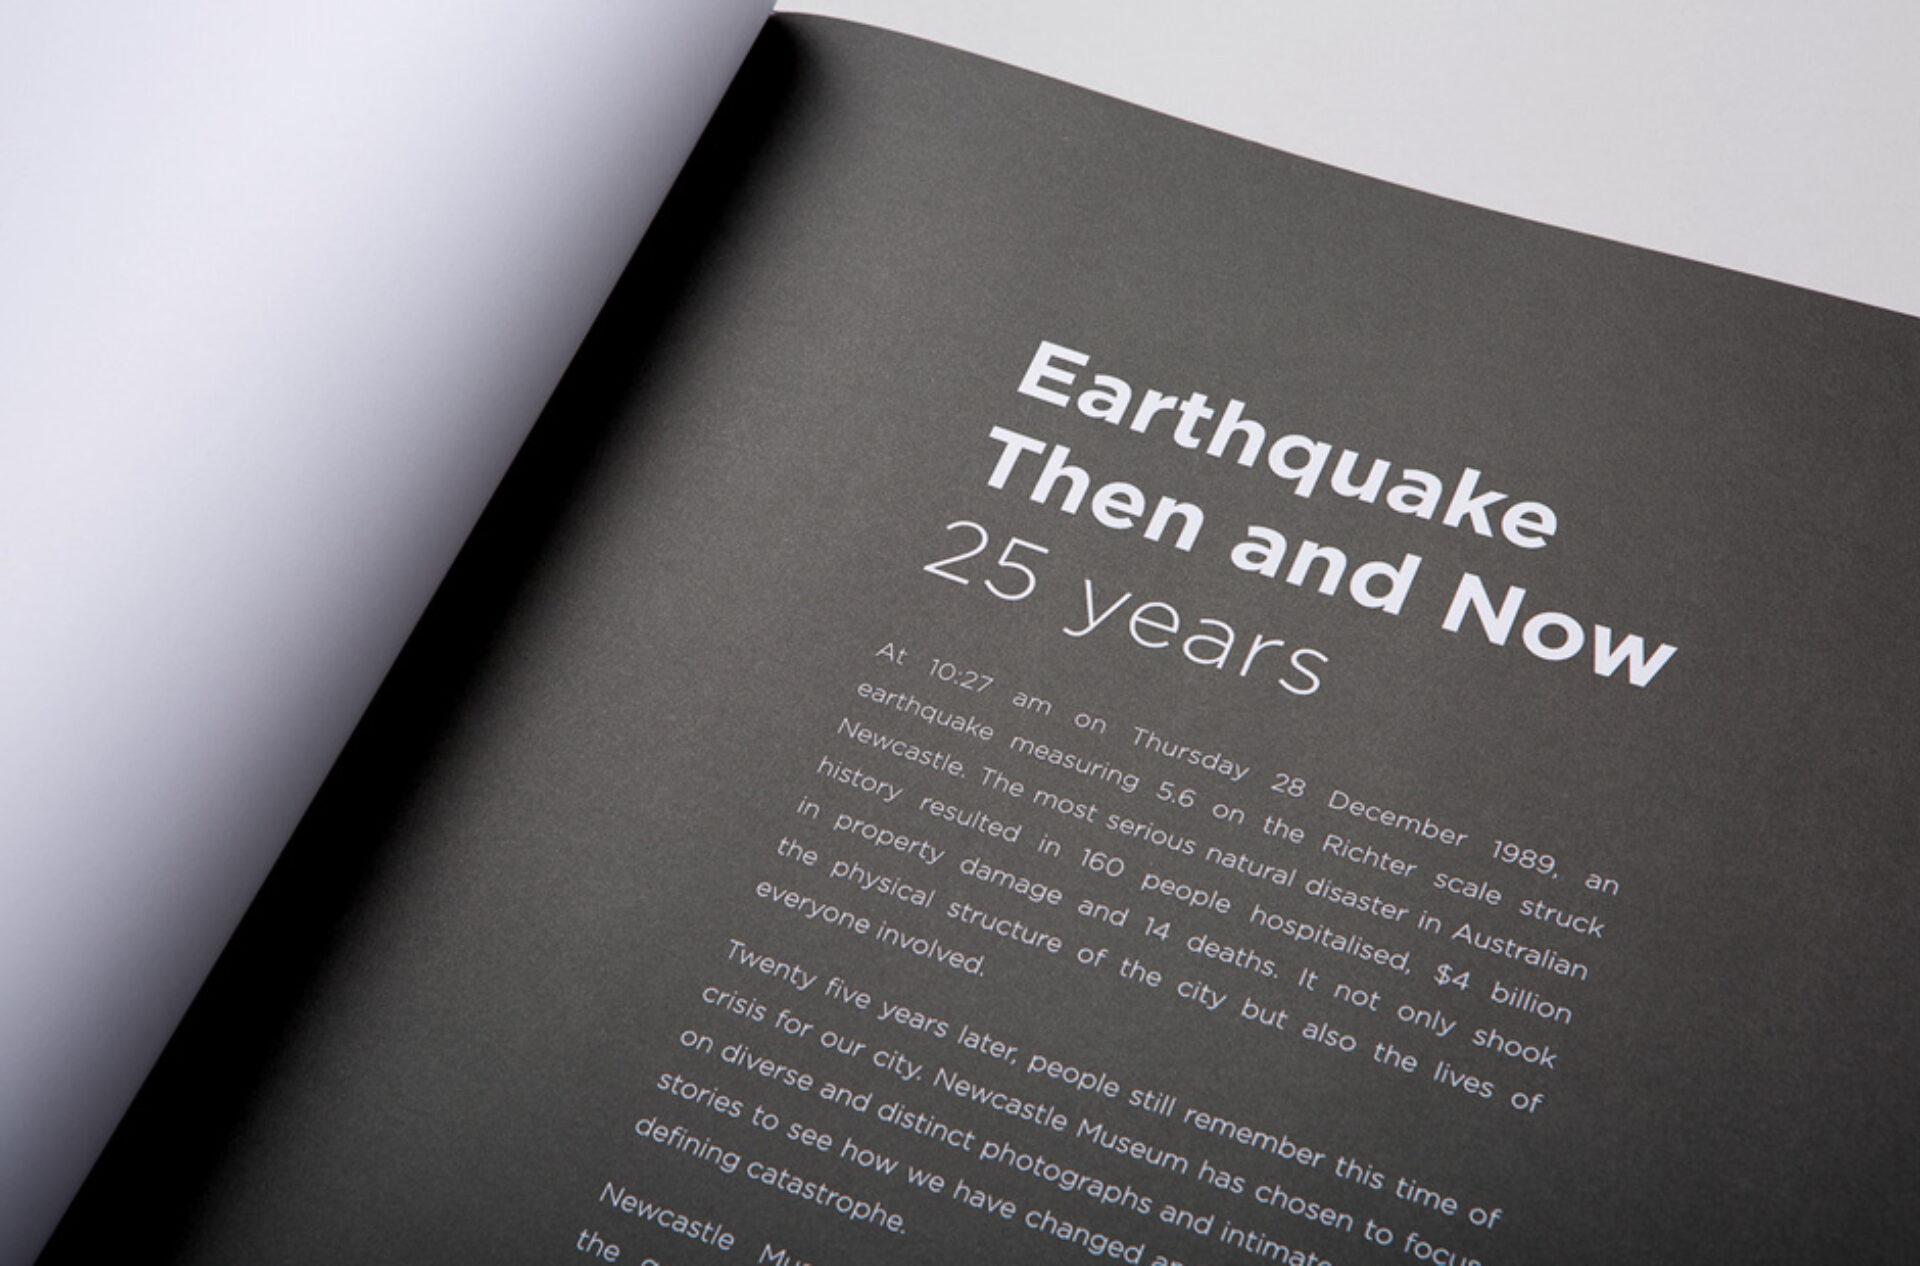 Headjam newcastle museum earthquake 010